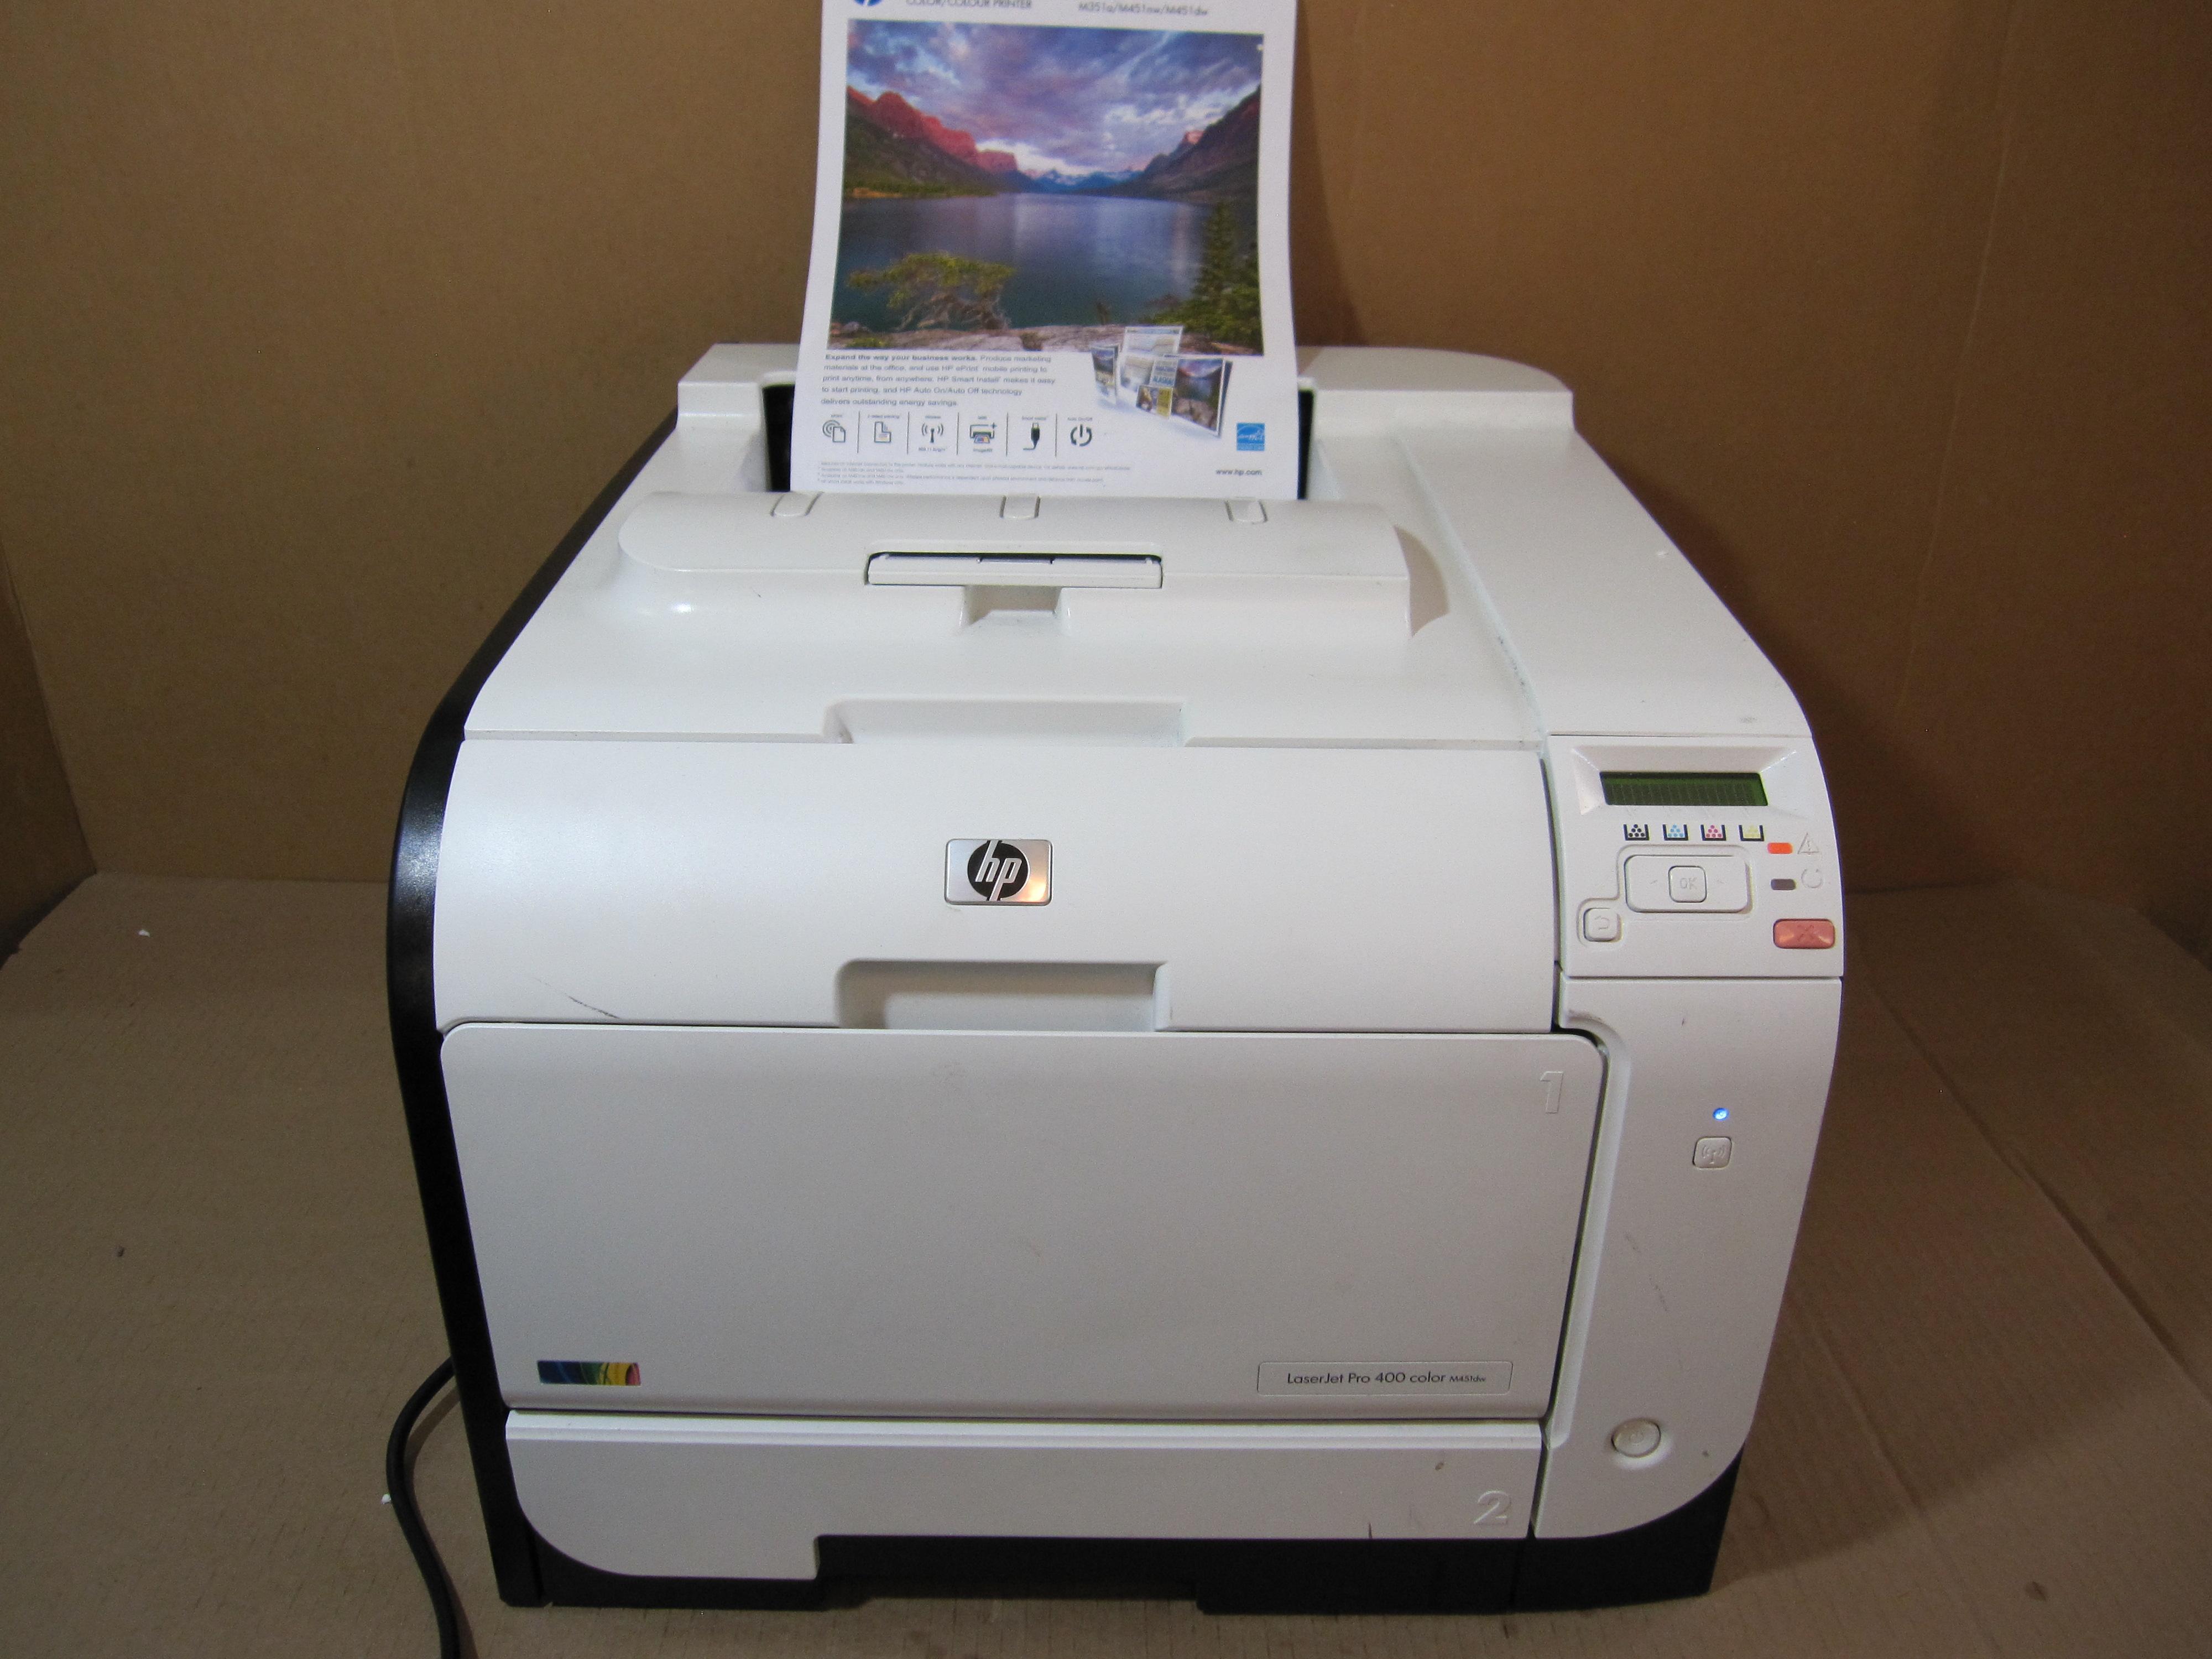 Hp Laserjet Pro 400 M451dw Color Wireless Photo Printer Ce958a Imagine41